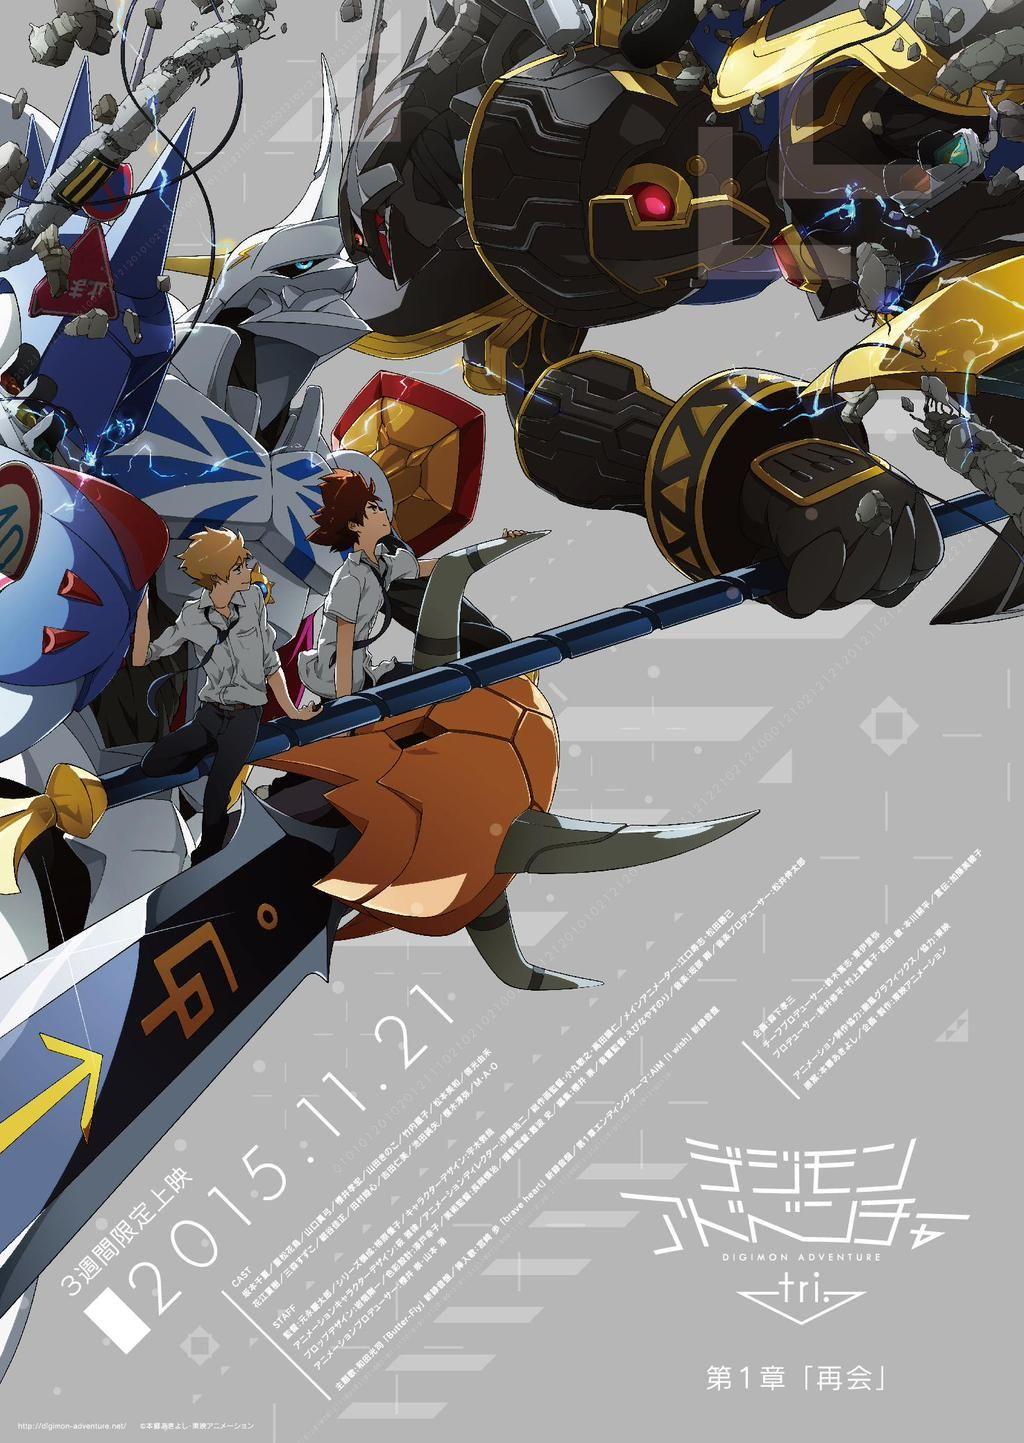 Animevoice Digimon Adventure Digimon Digimon Digital Monsters